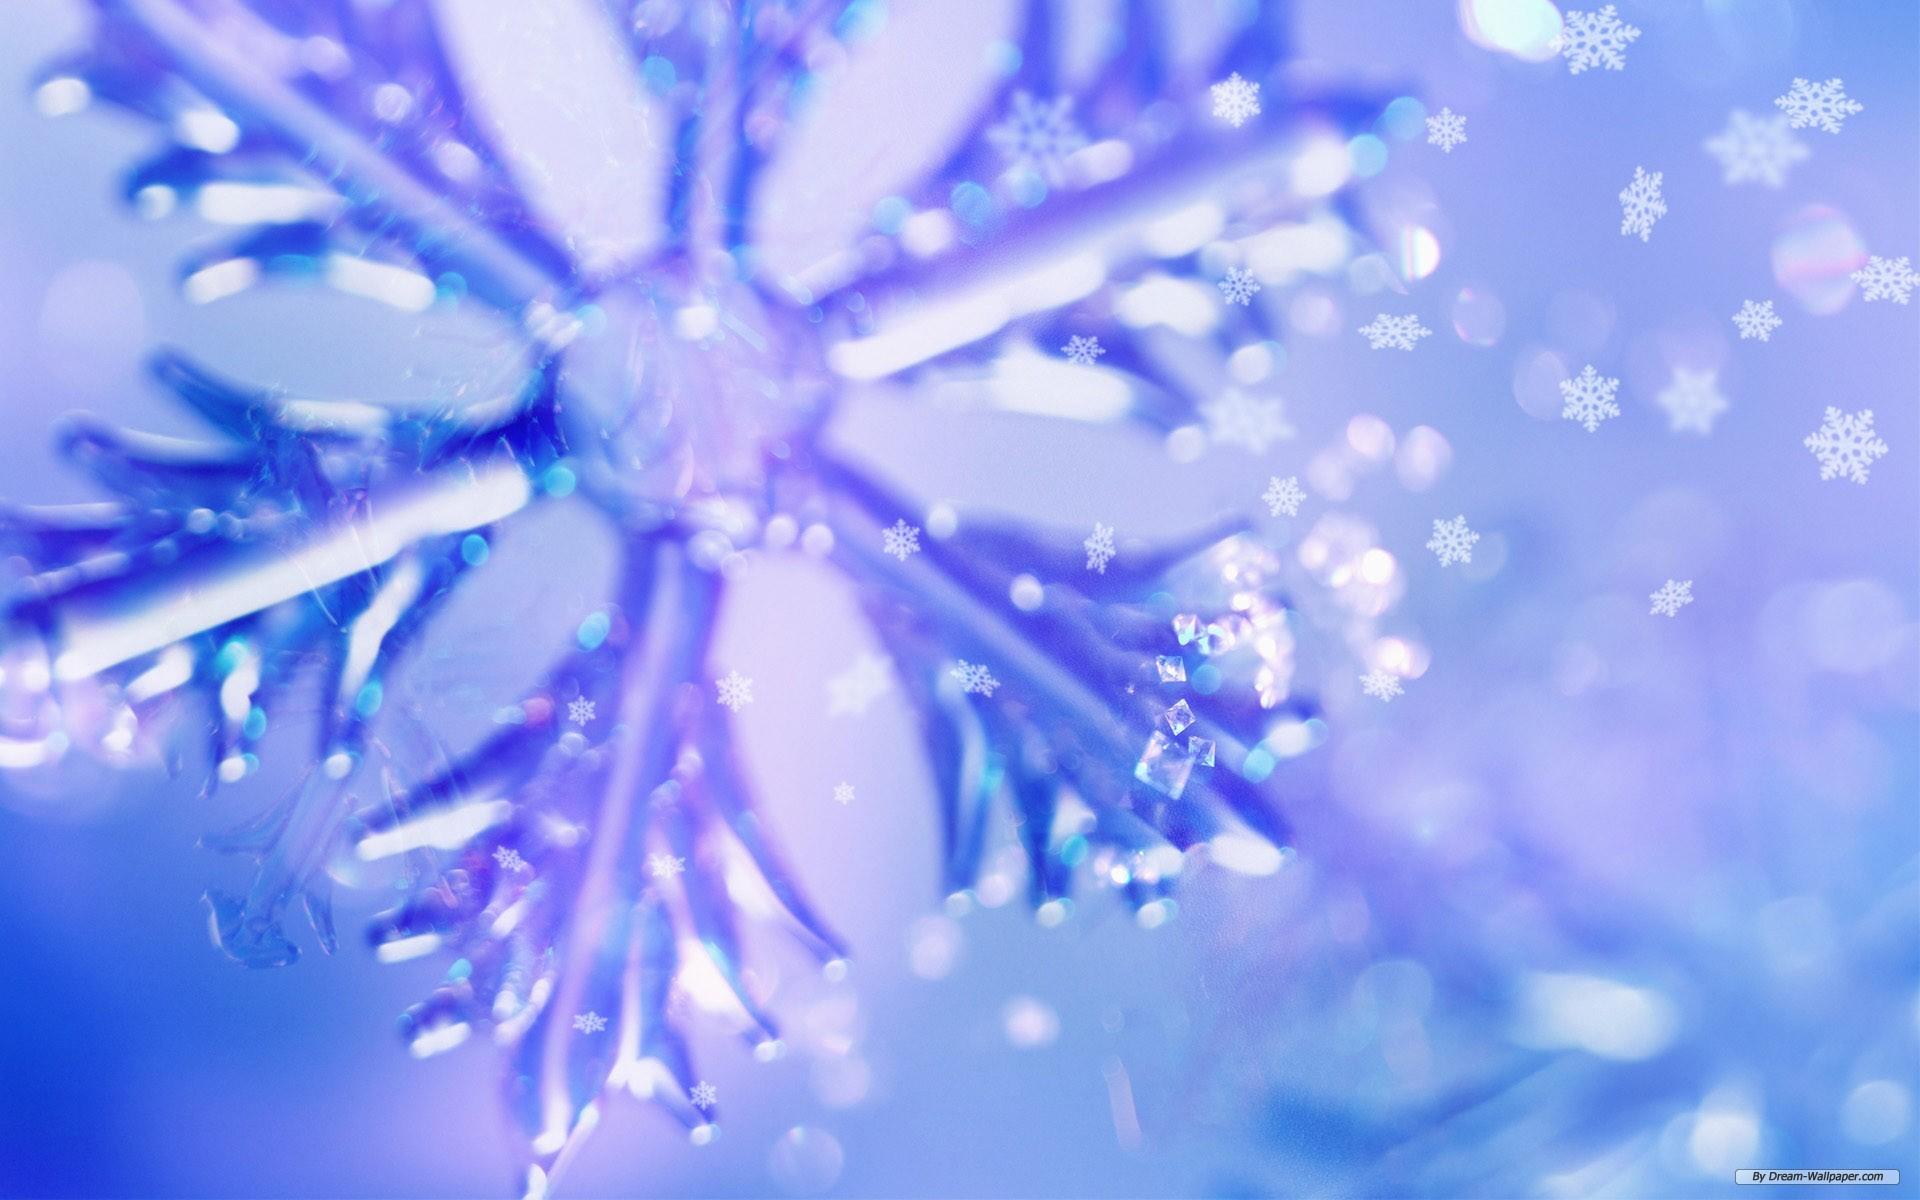 wallpaper, Winter Screen Savers hd wallpaper, background desktop .